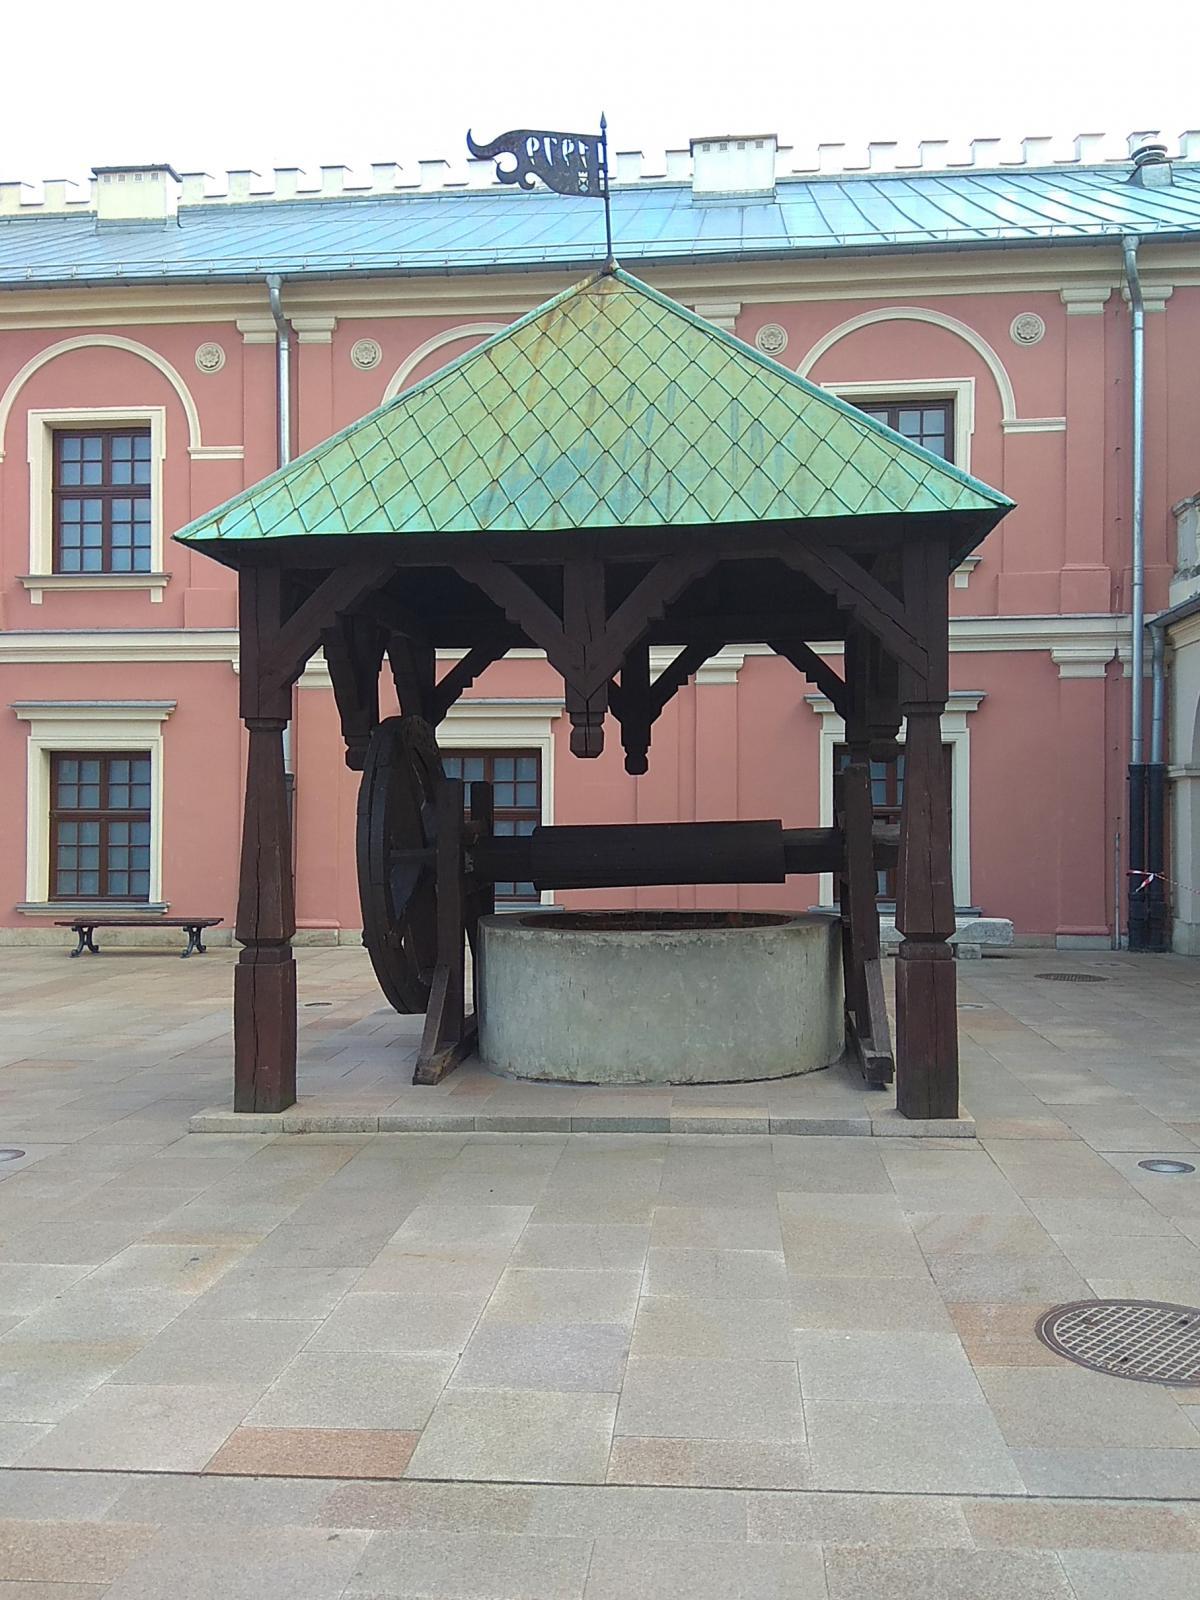 Колодец во внутреннем дворе замка / фото Варвара Вайс